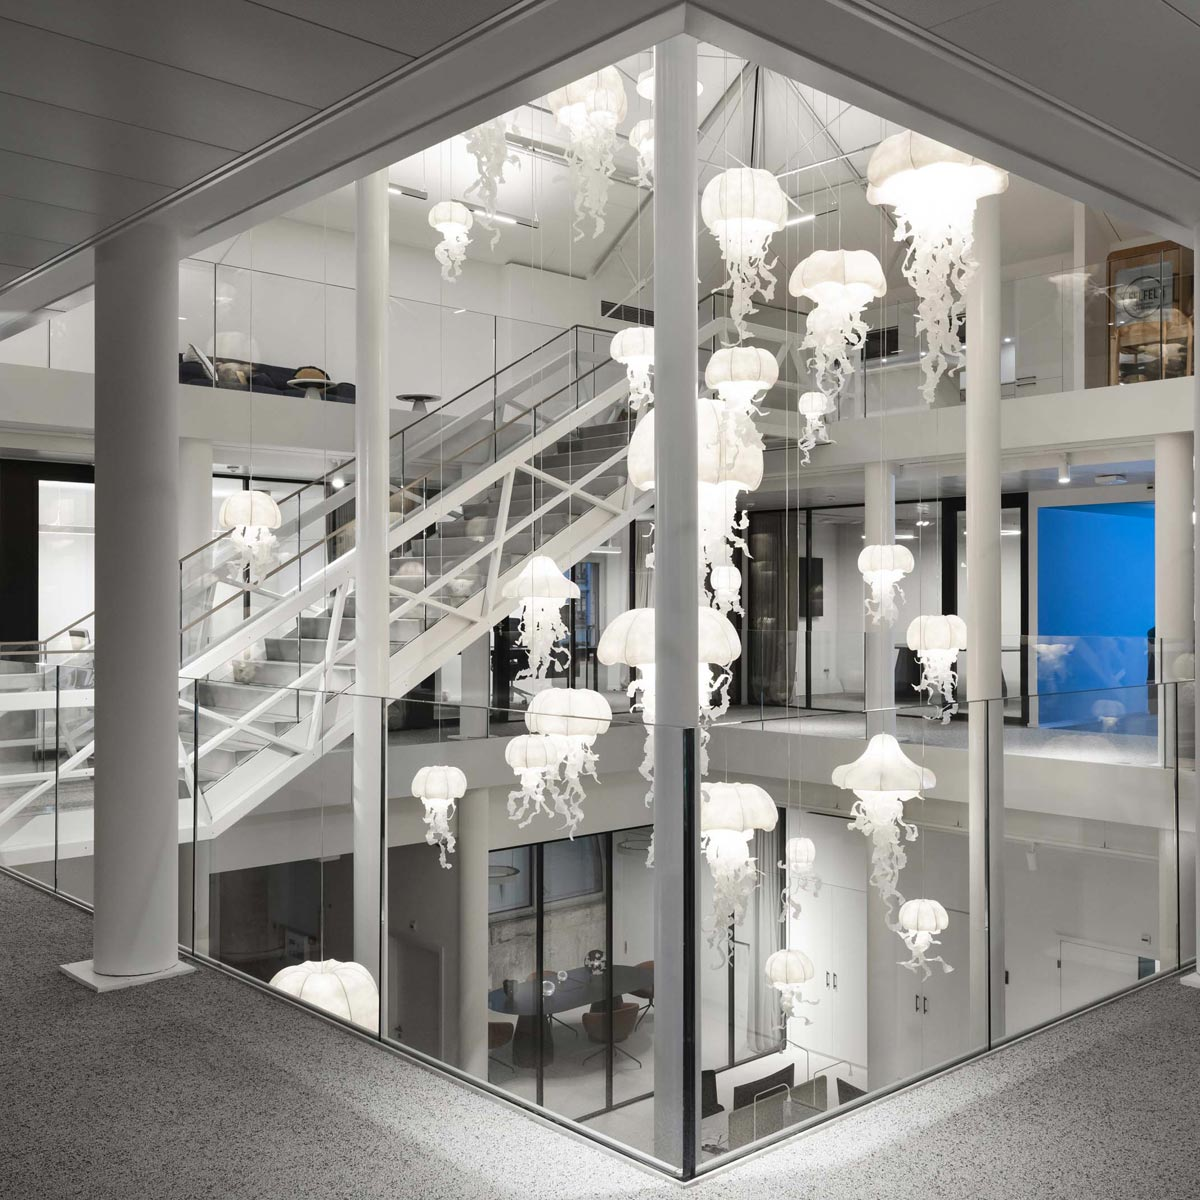 La Cote des Montres : Photo - « Arcades des Arts » un nom, deux fondations